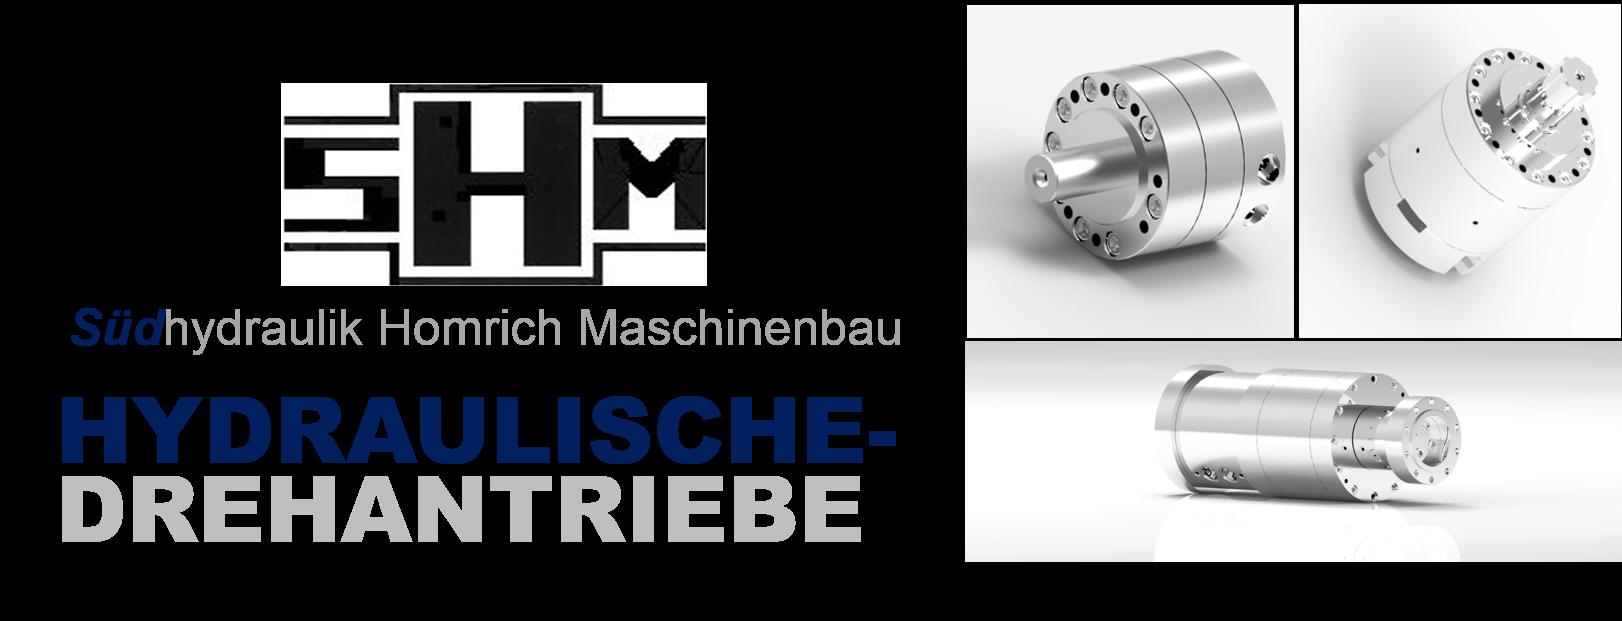 SHM südhydraulik Homrich Maschinenbau GmbH